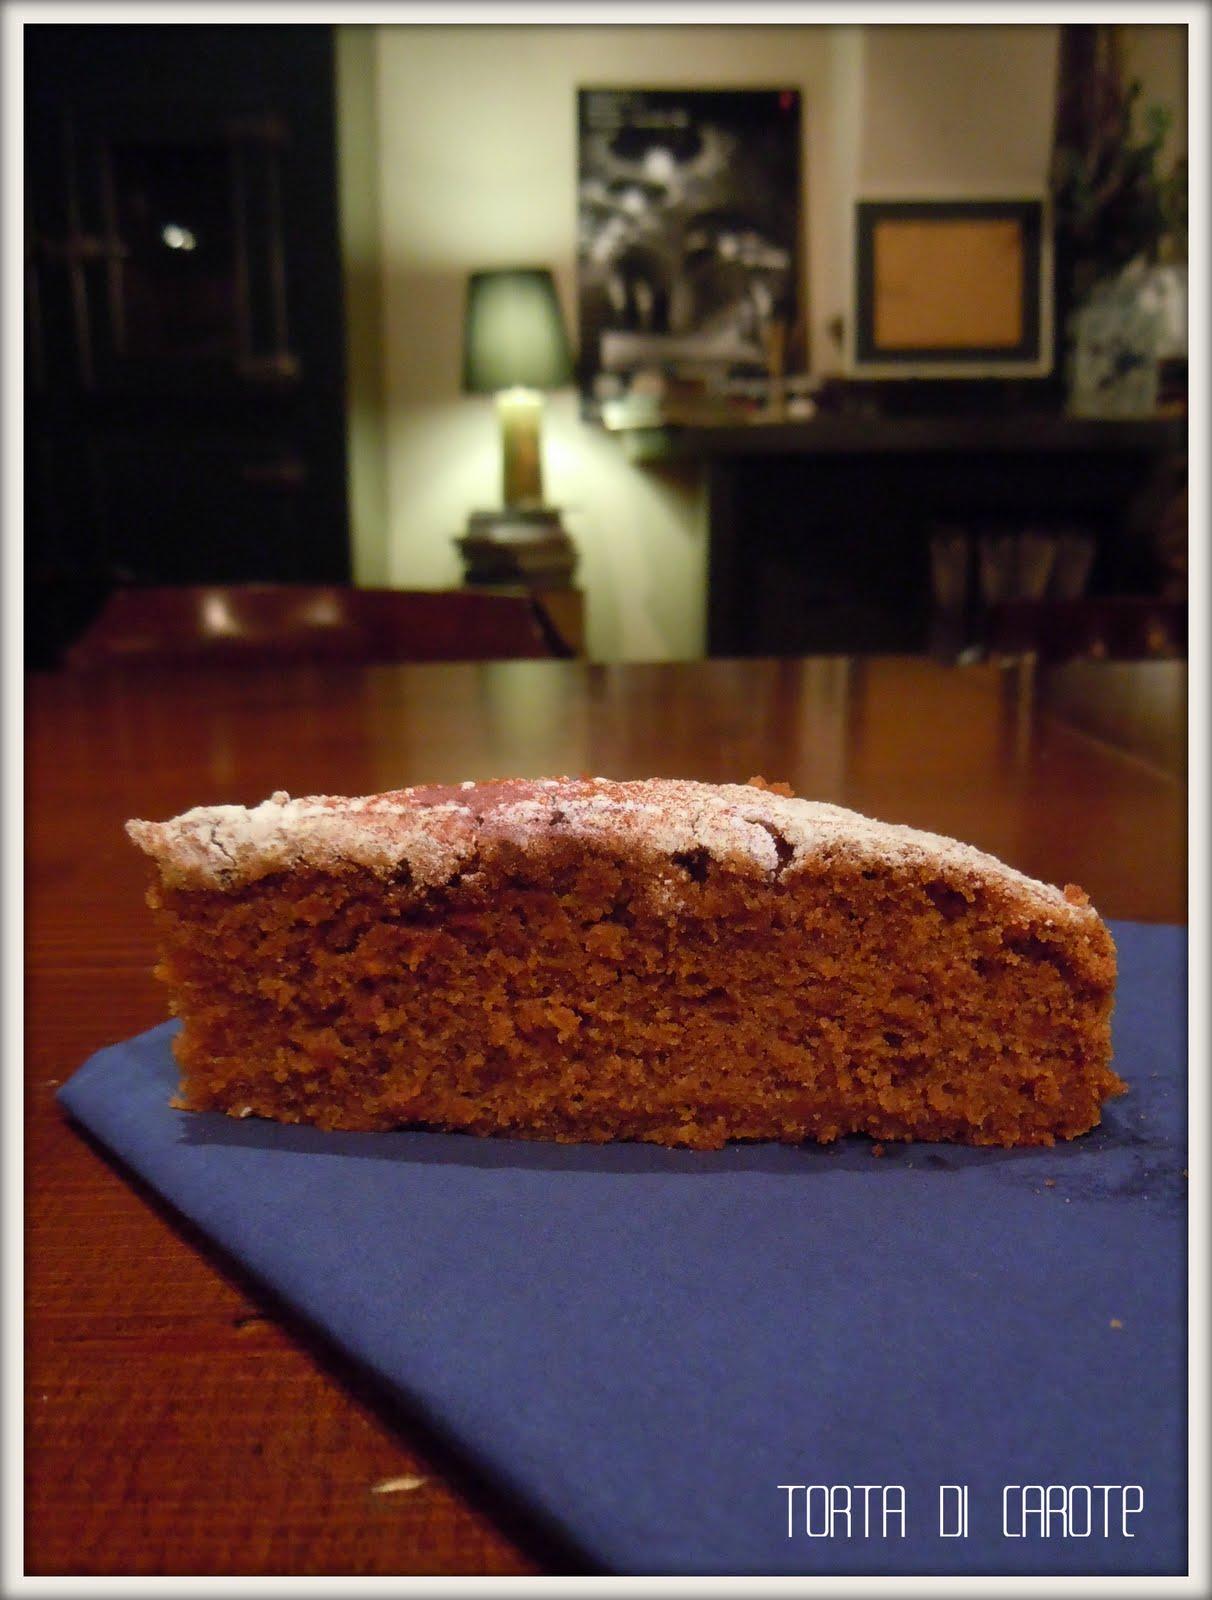 La migliore torta di carote al mondo parola di leila lindholm cucinopertescemo - Migliore cucina al mondo ...